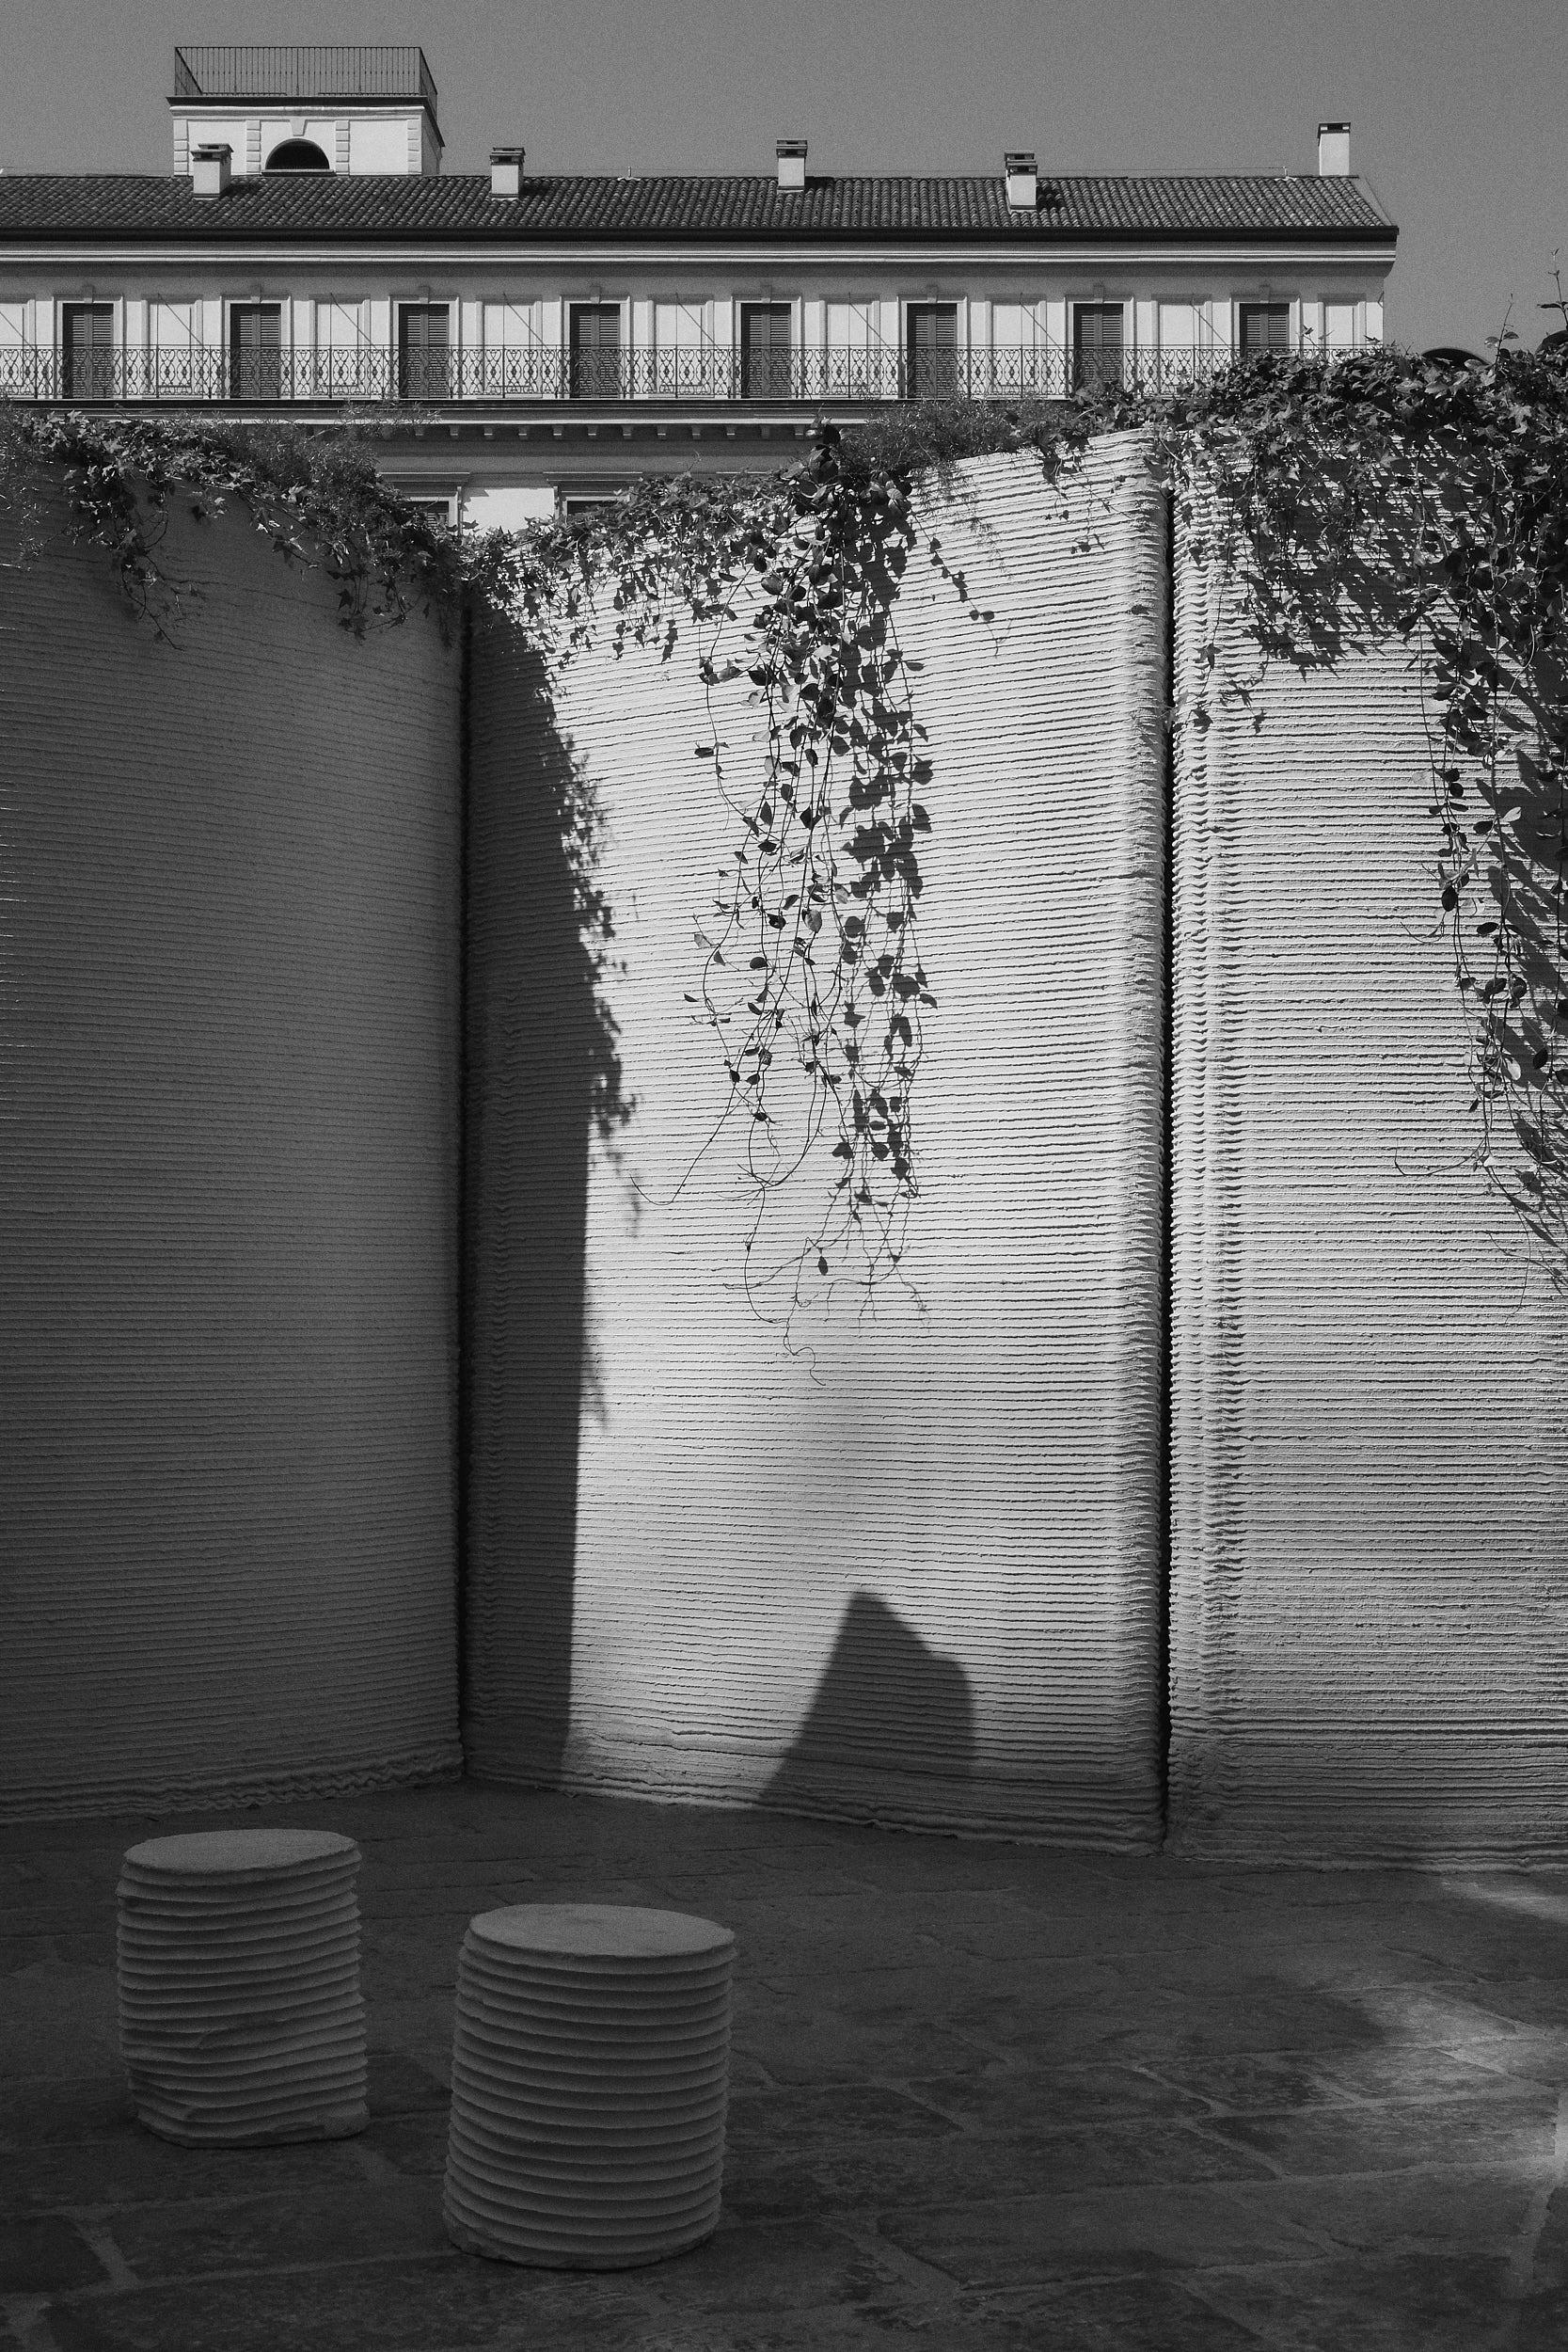 3D Housing 05 by CLS Architetti on Anniversary Magazine. Photo by Alex Lesage — threefold 13.jpg